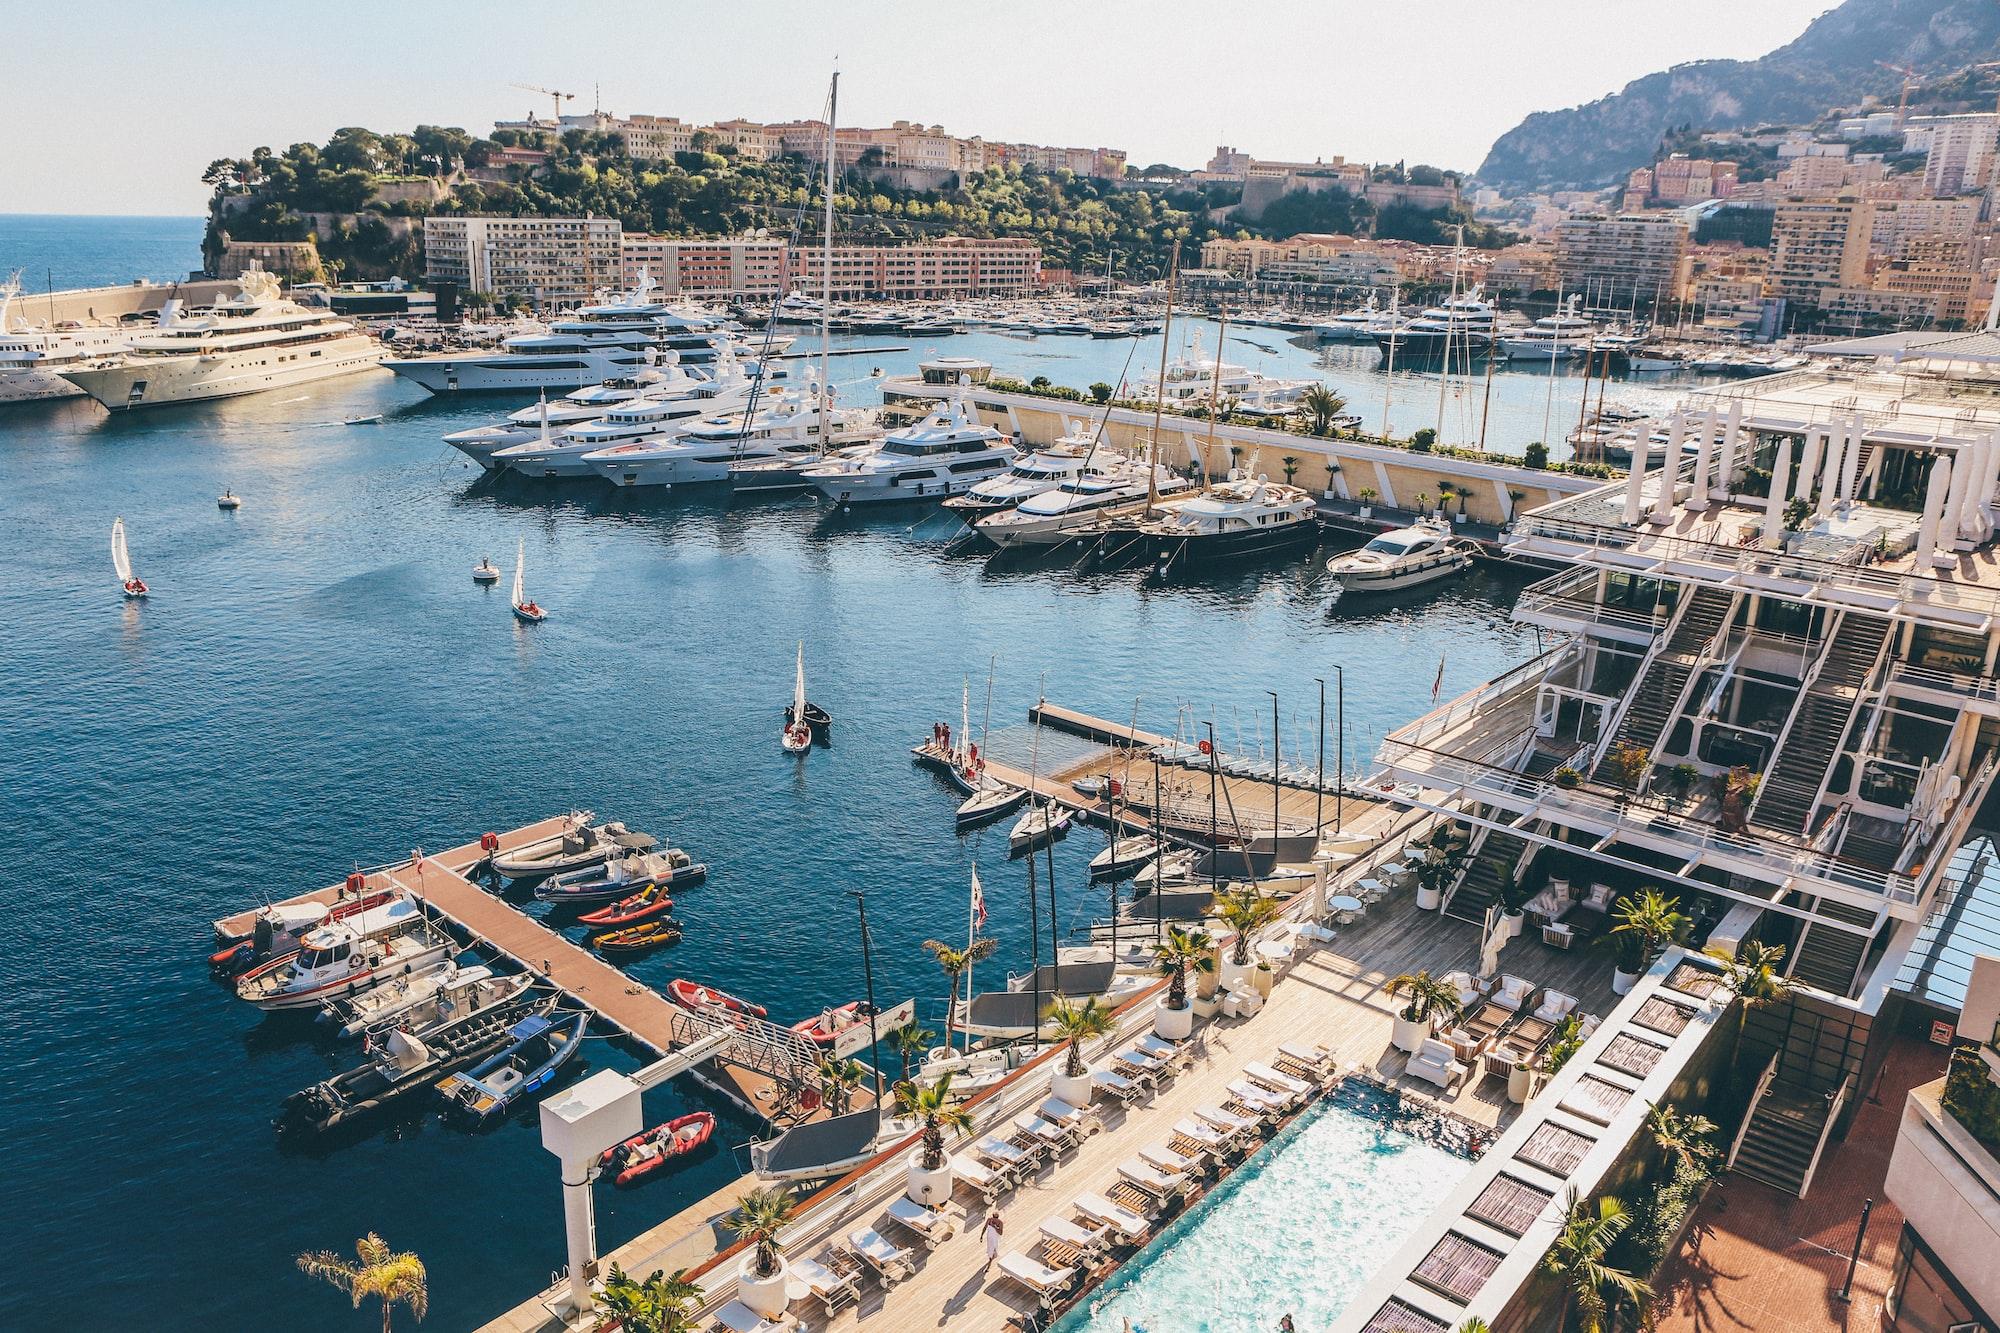 Spring time in Monte Carlo, Monaco